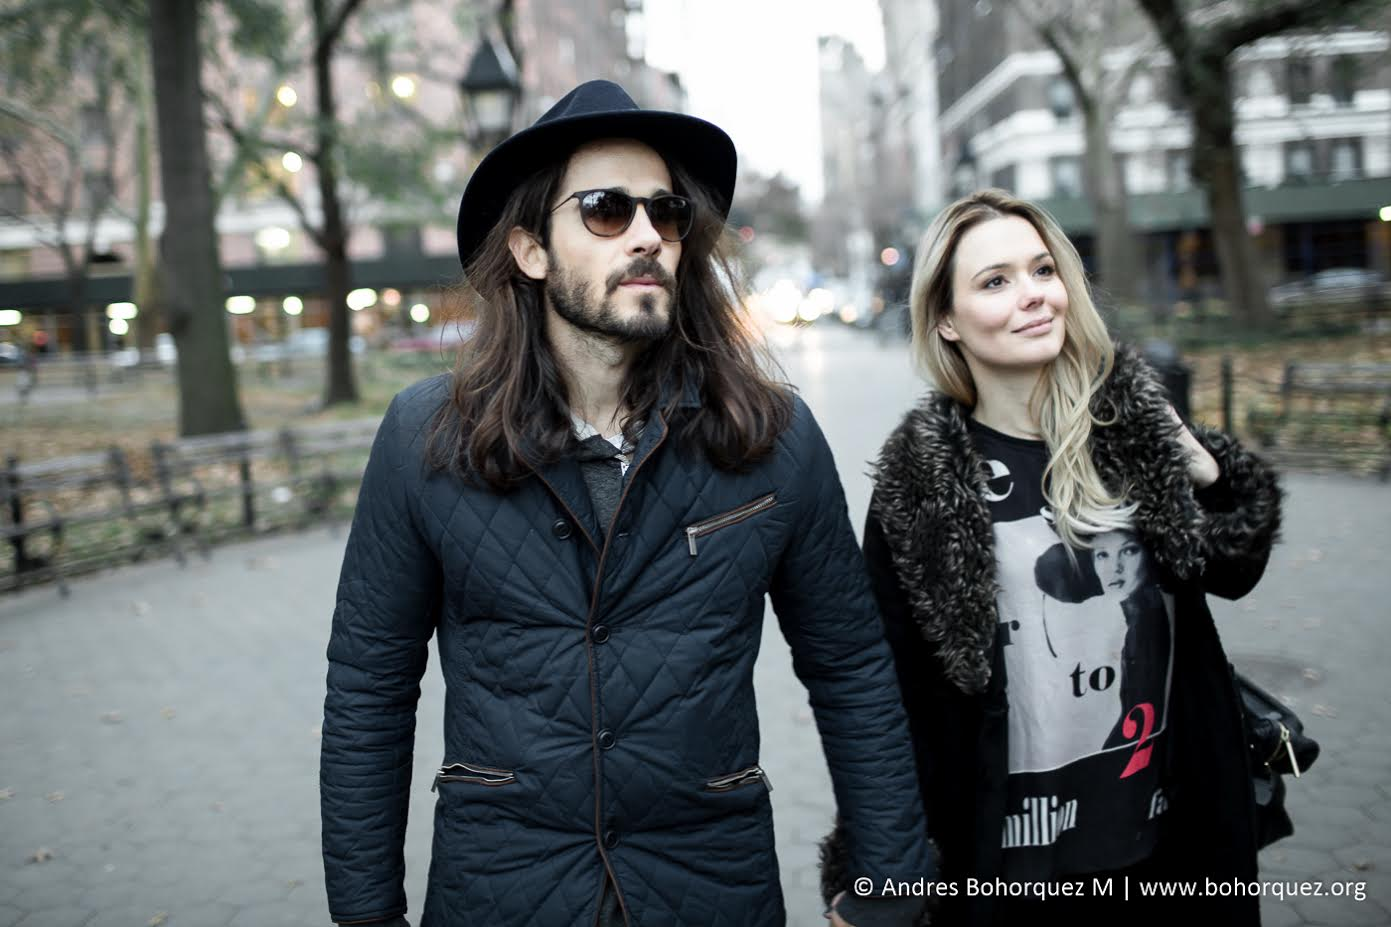 Graziella Schmitt and paulo Leal by Andres Bohorquez.jpg